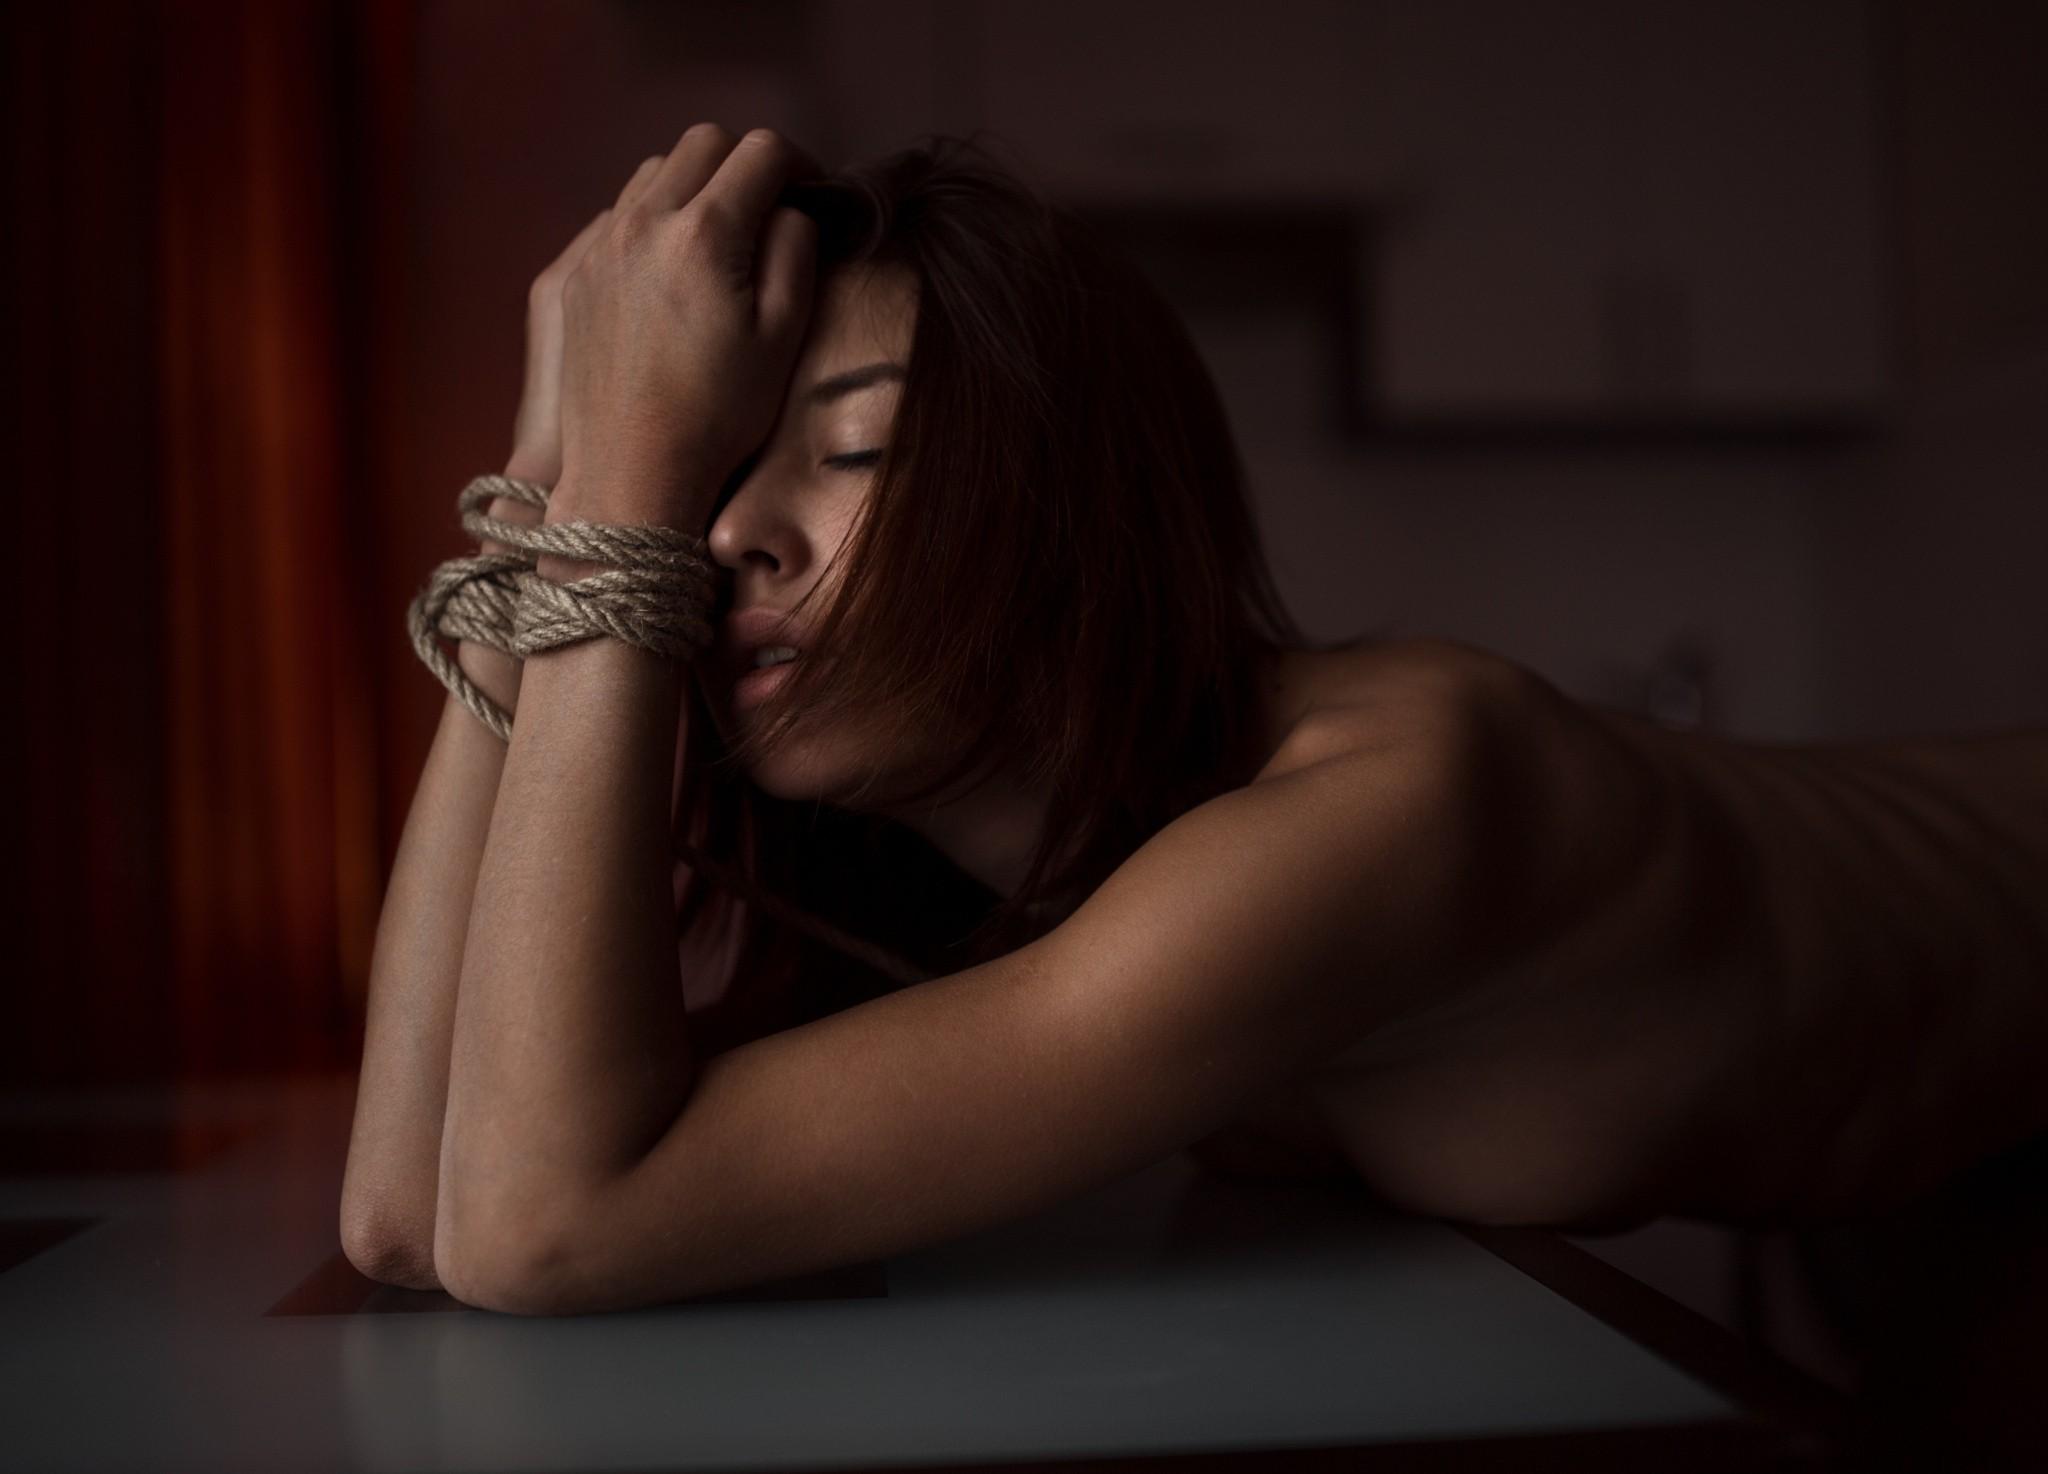 People 2048x1474 women nude BDSM boobs skinny ribs redhead closed eyes sideboob bent over Roman Filippov